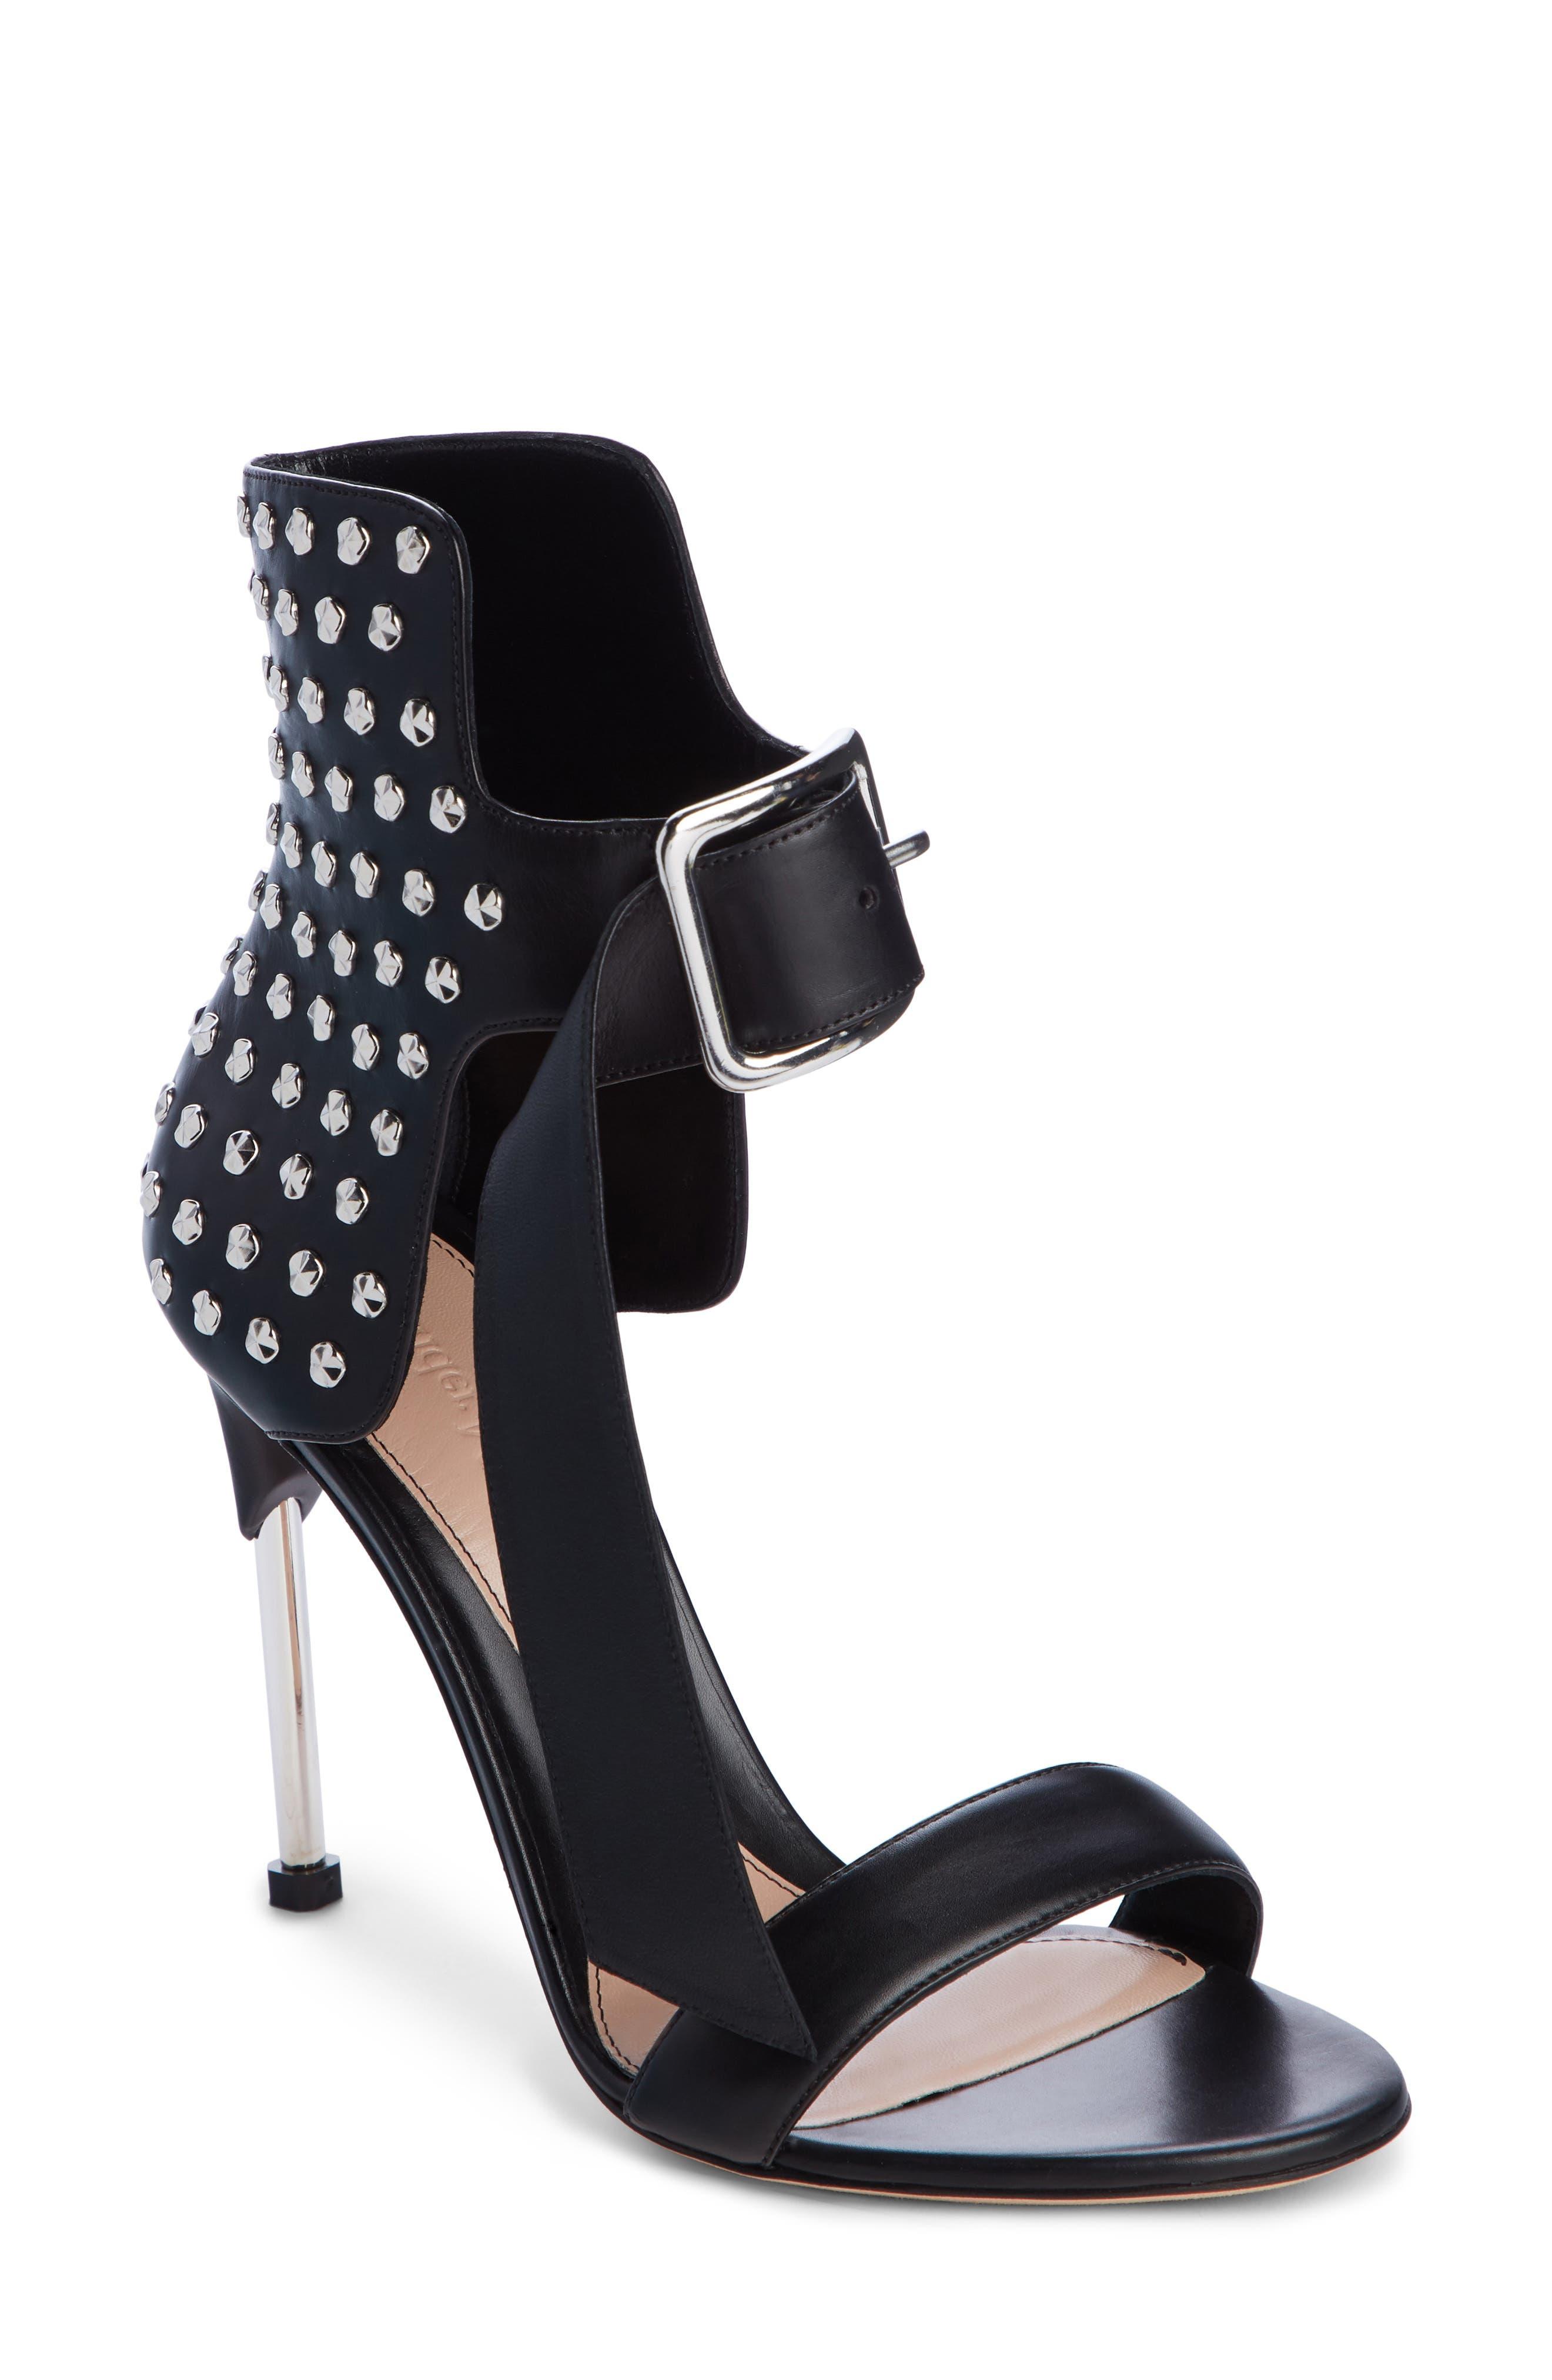 ALEXANDER MCQUEEN,                             Studded Ankle Strap Sandal,                             Main thumbnail 1, color,                             BLACK